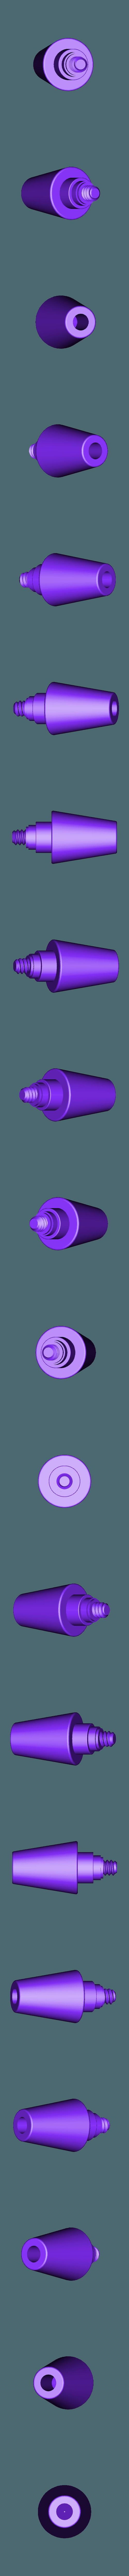 Barrel_-_Part_5.stl Download free STL file 9 gague plasma pistol with barrel tip cover (MPMS mini) • 3D print template, PM_ME_YOUR_VALUE